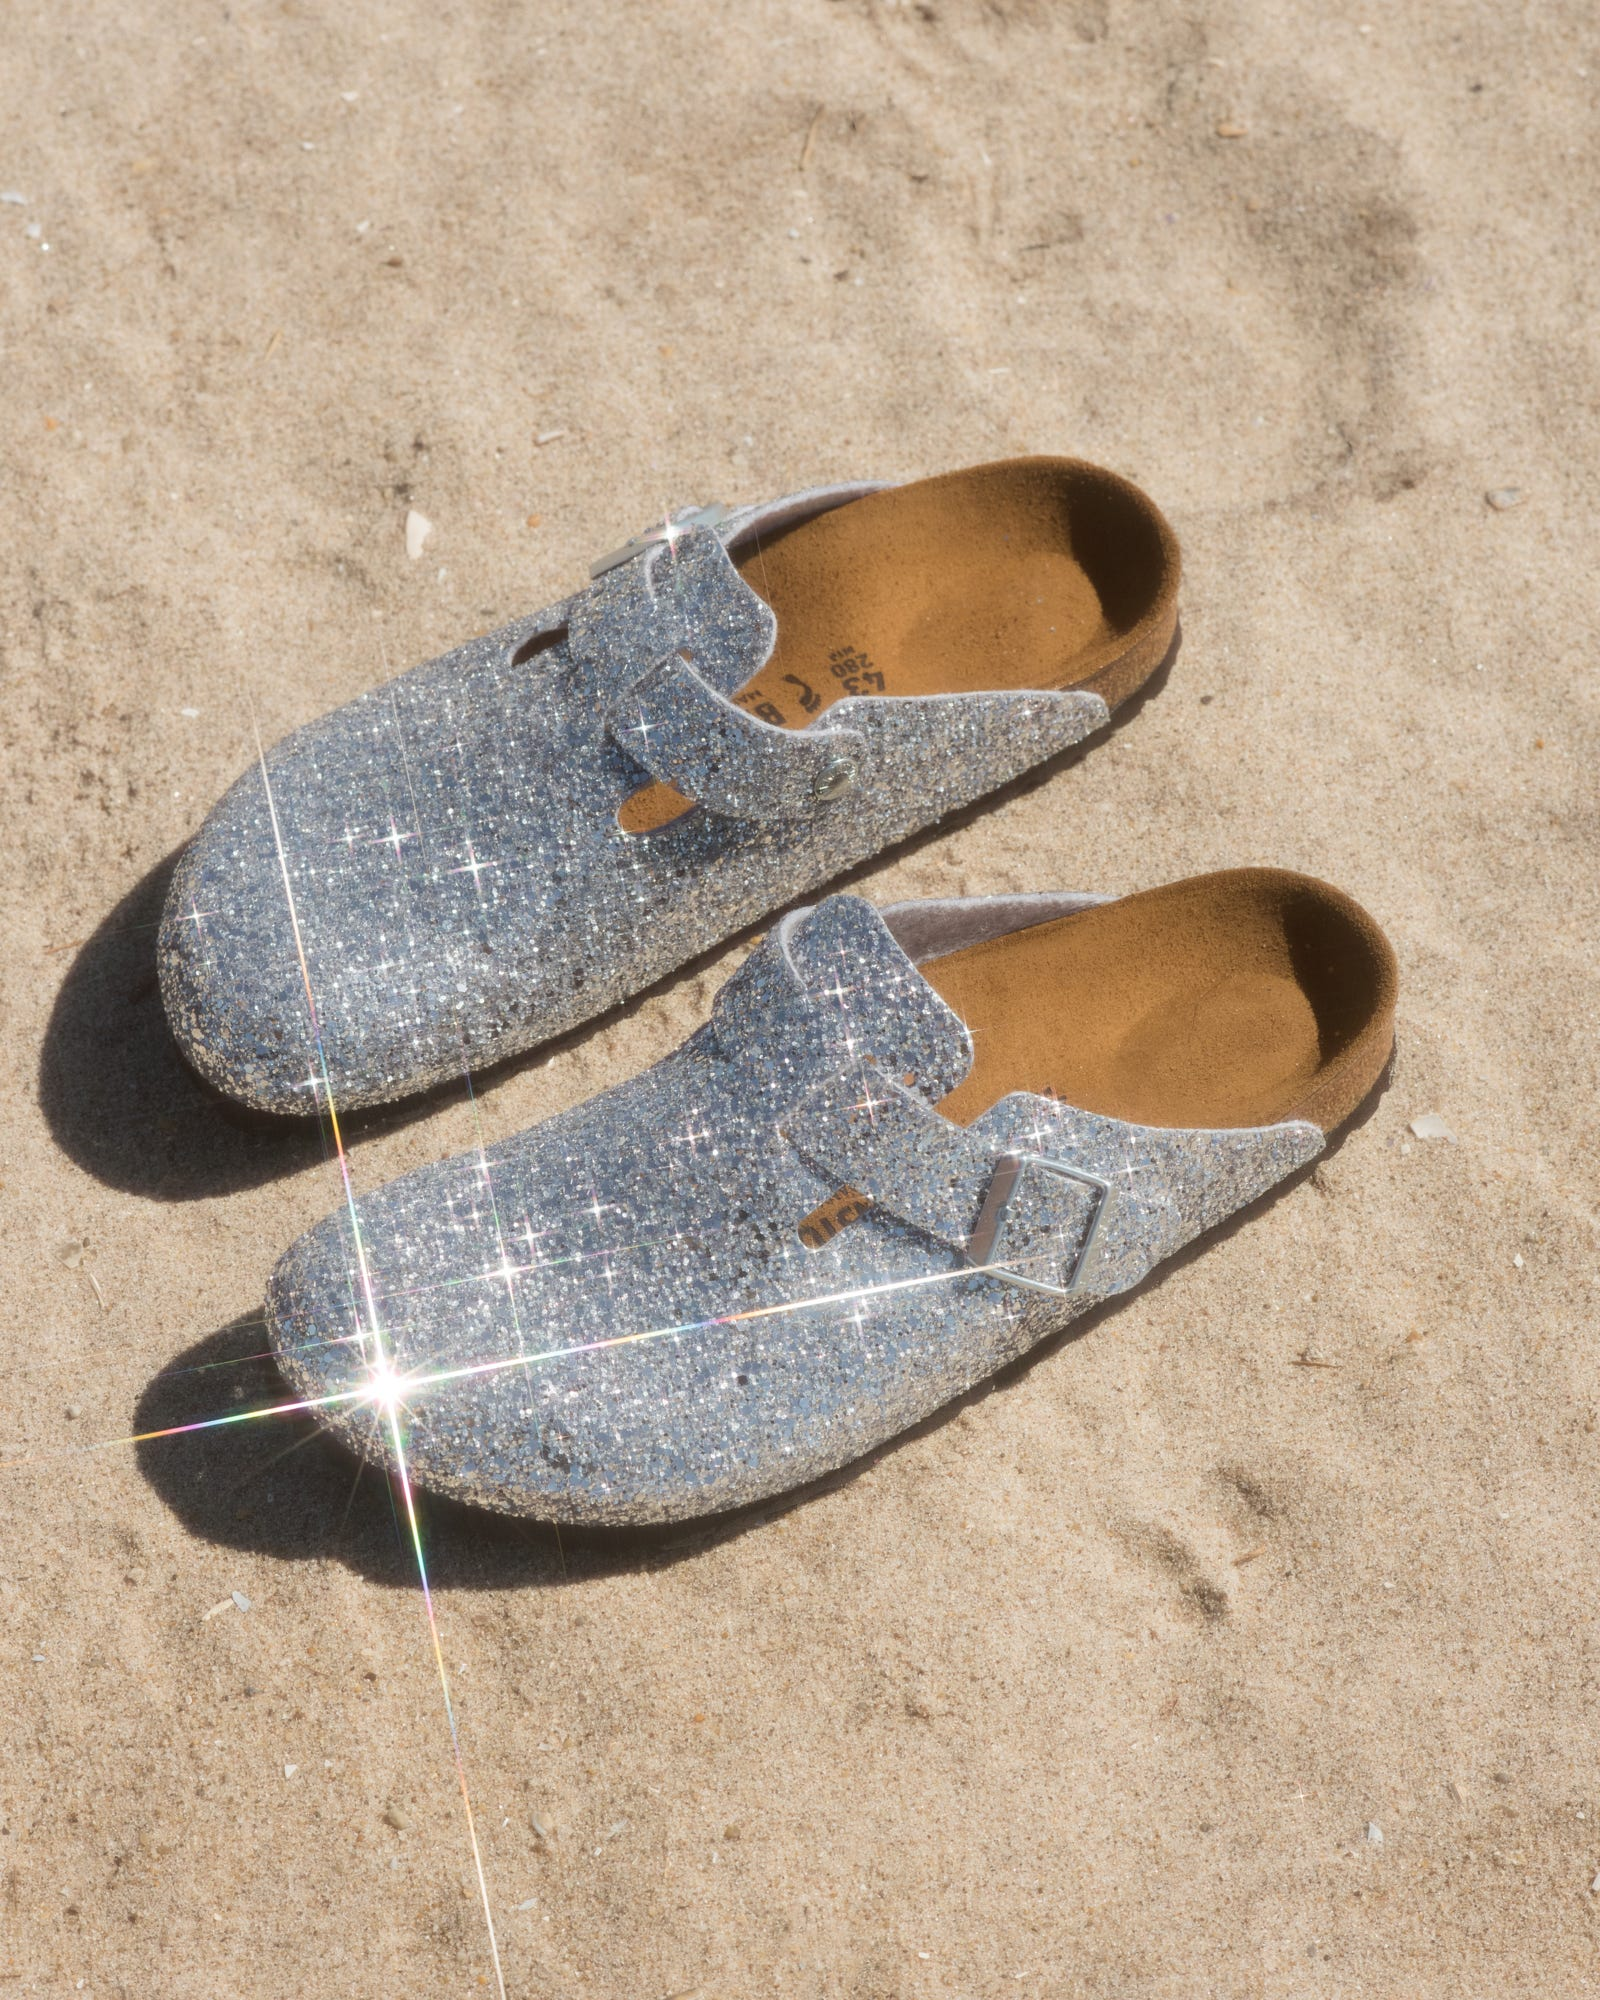 a110fb9b6f3a Opening Ceremony x Birkenstock New Glittery Sandals